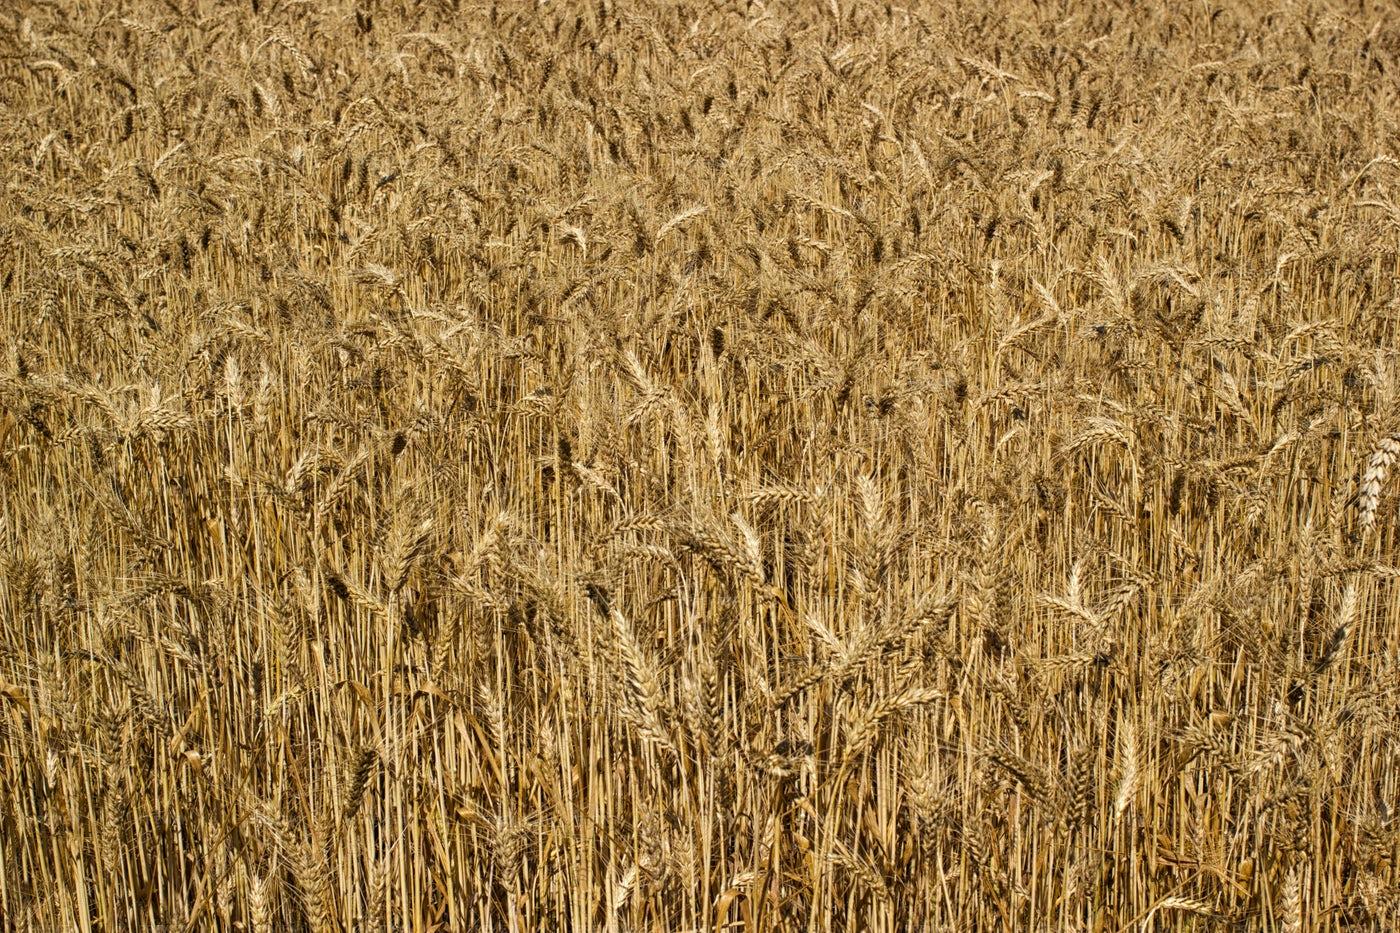 Ripe Wheat Background: Stock Photos